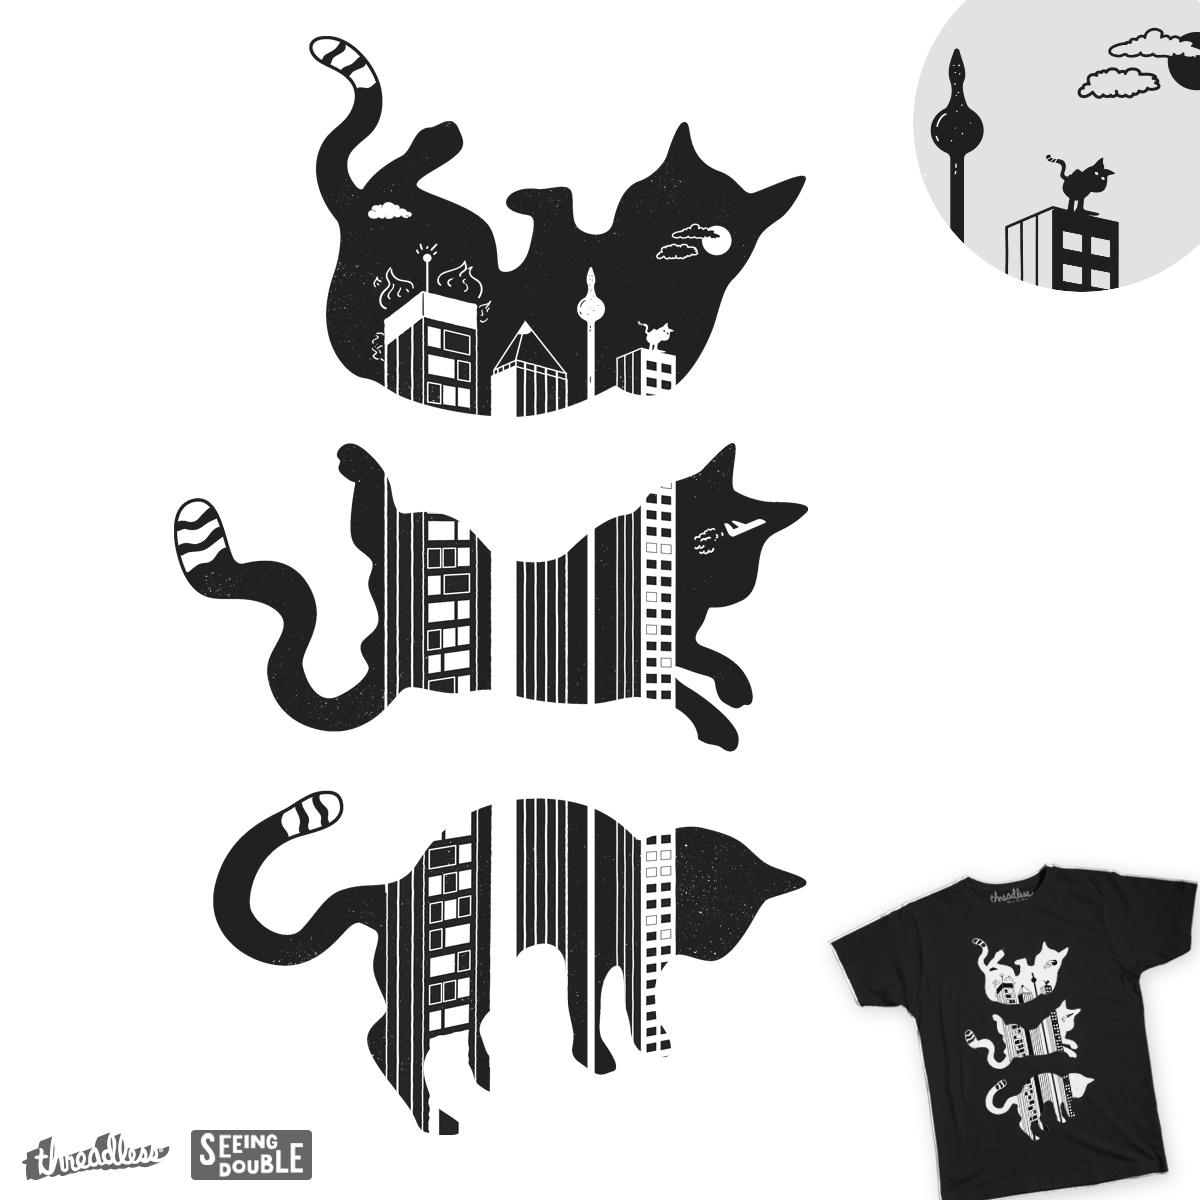 Cat Falls by darrudadesign on Threadless